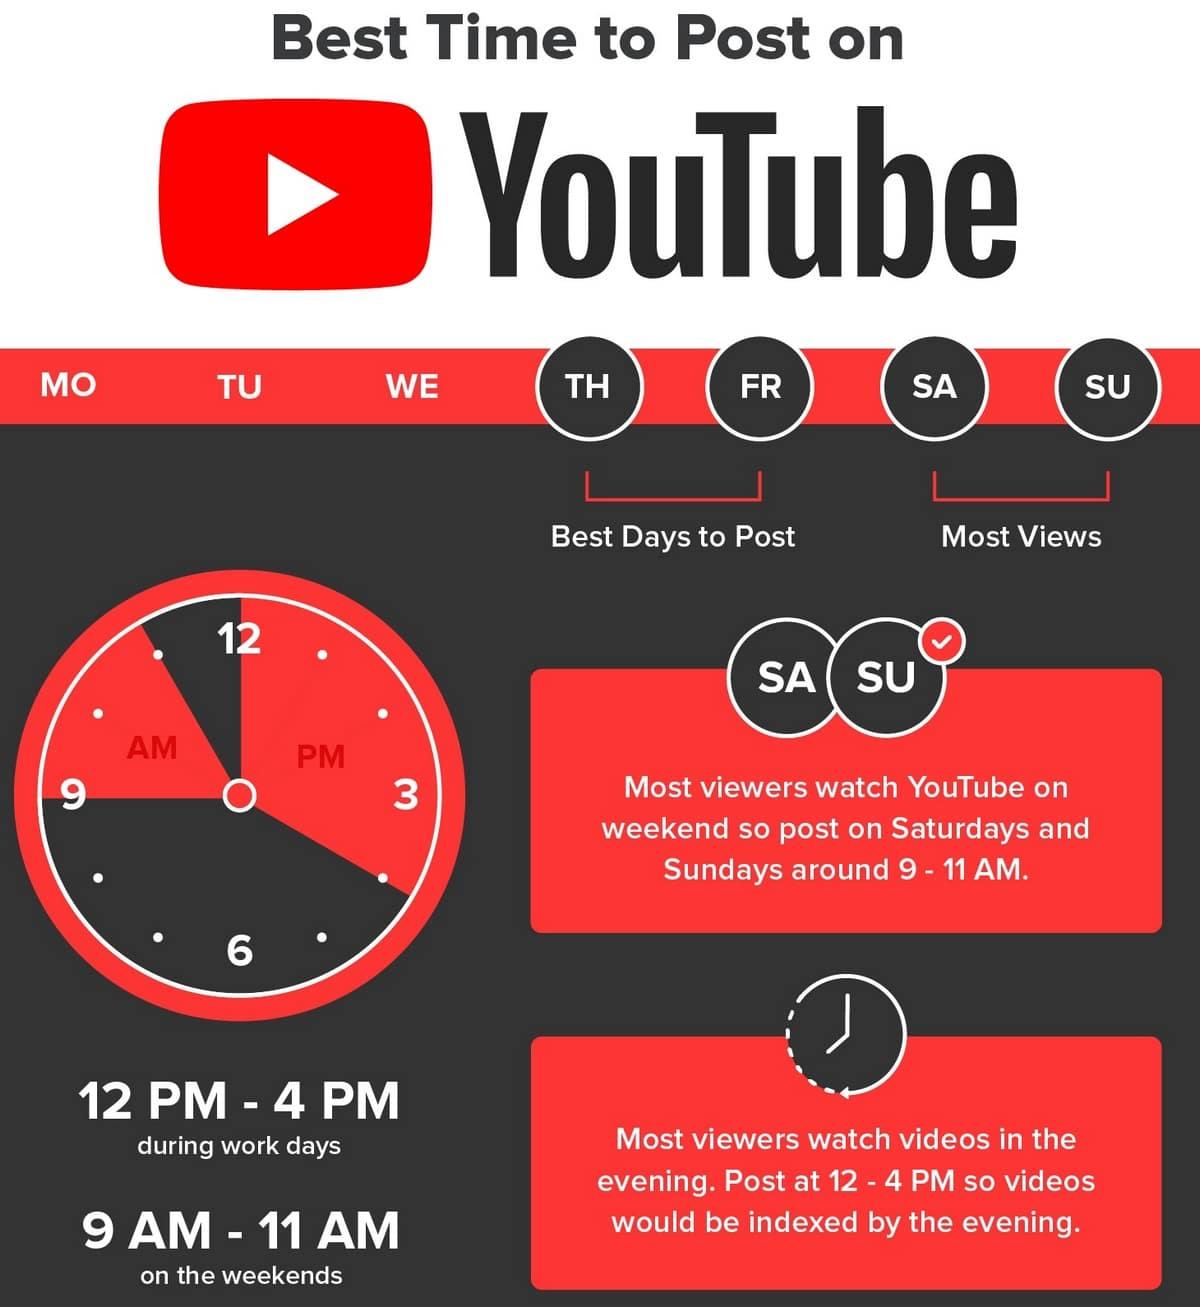 youtube marketing strategy 2020